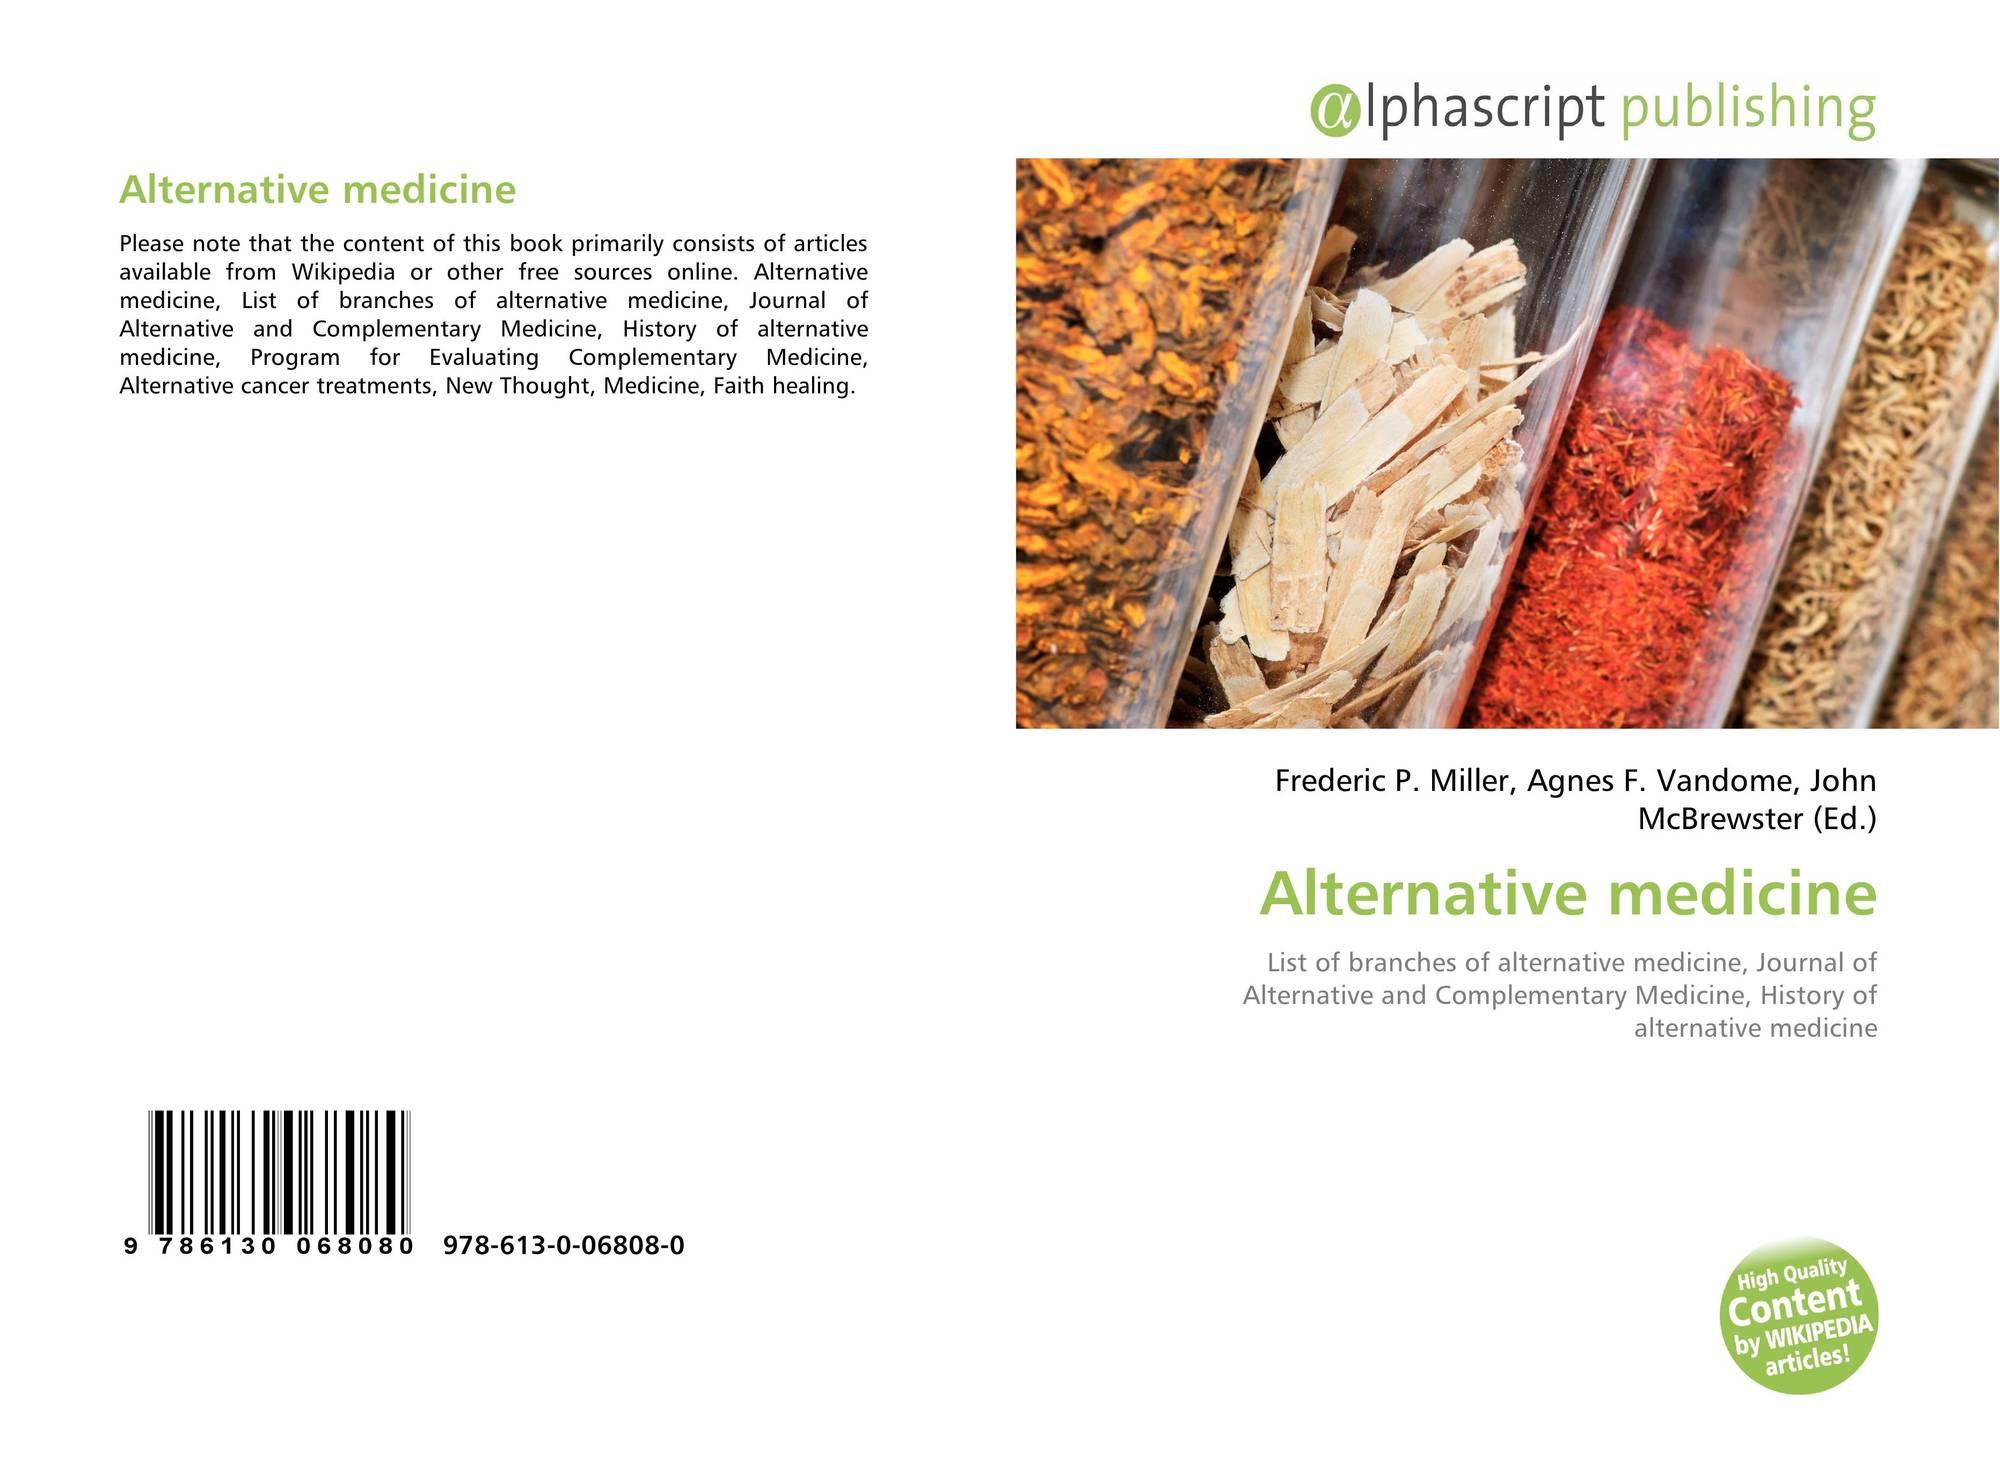 Alternative medicine, 978-613-0-06808-0, 6130068085